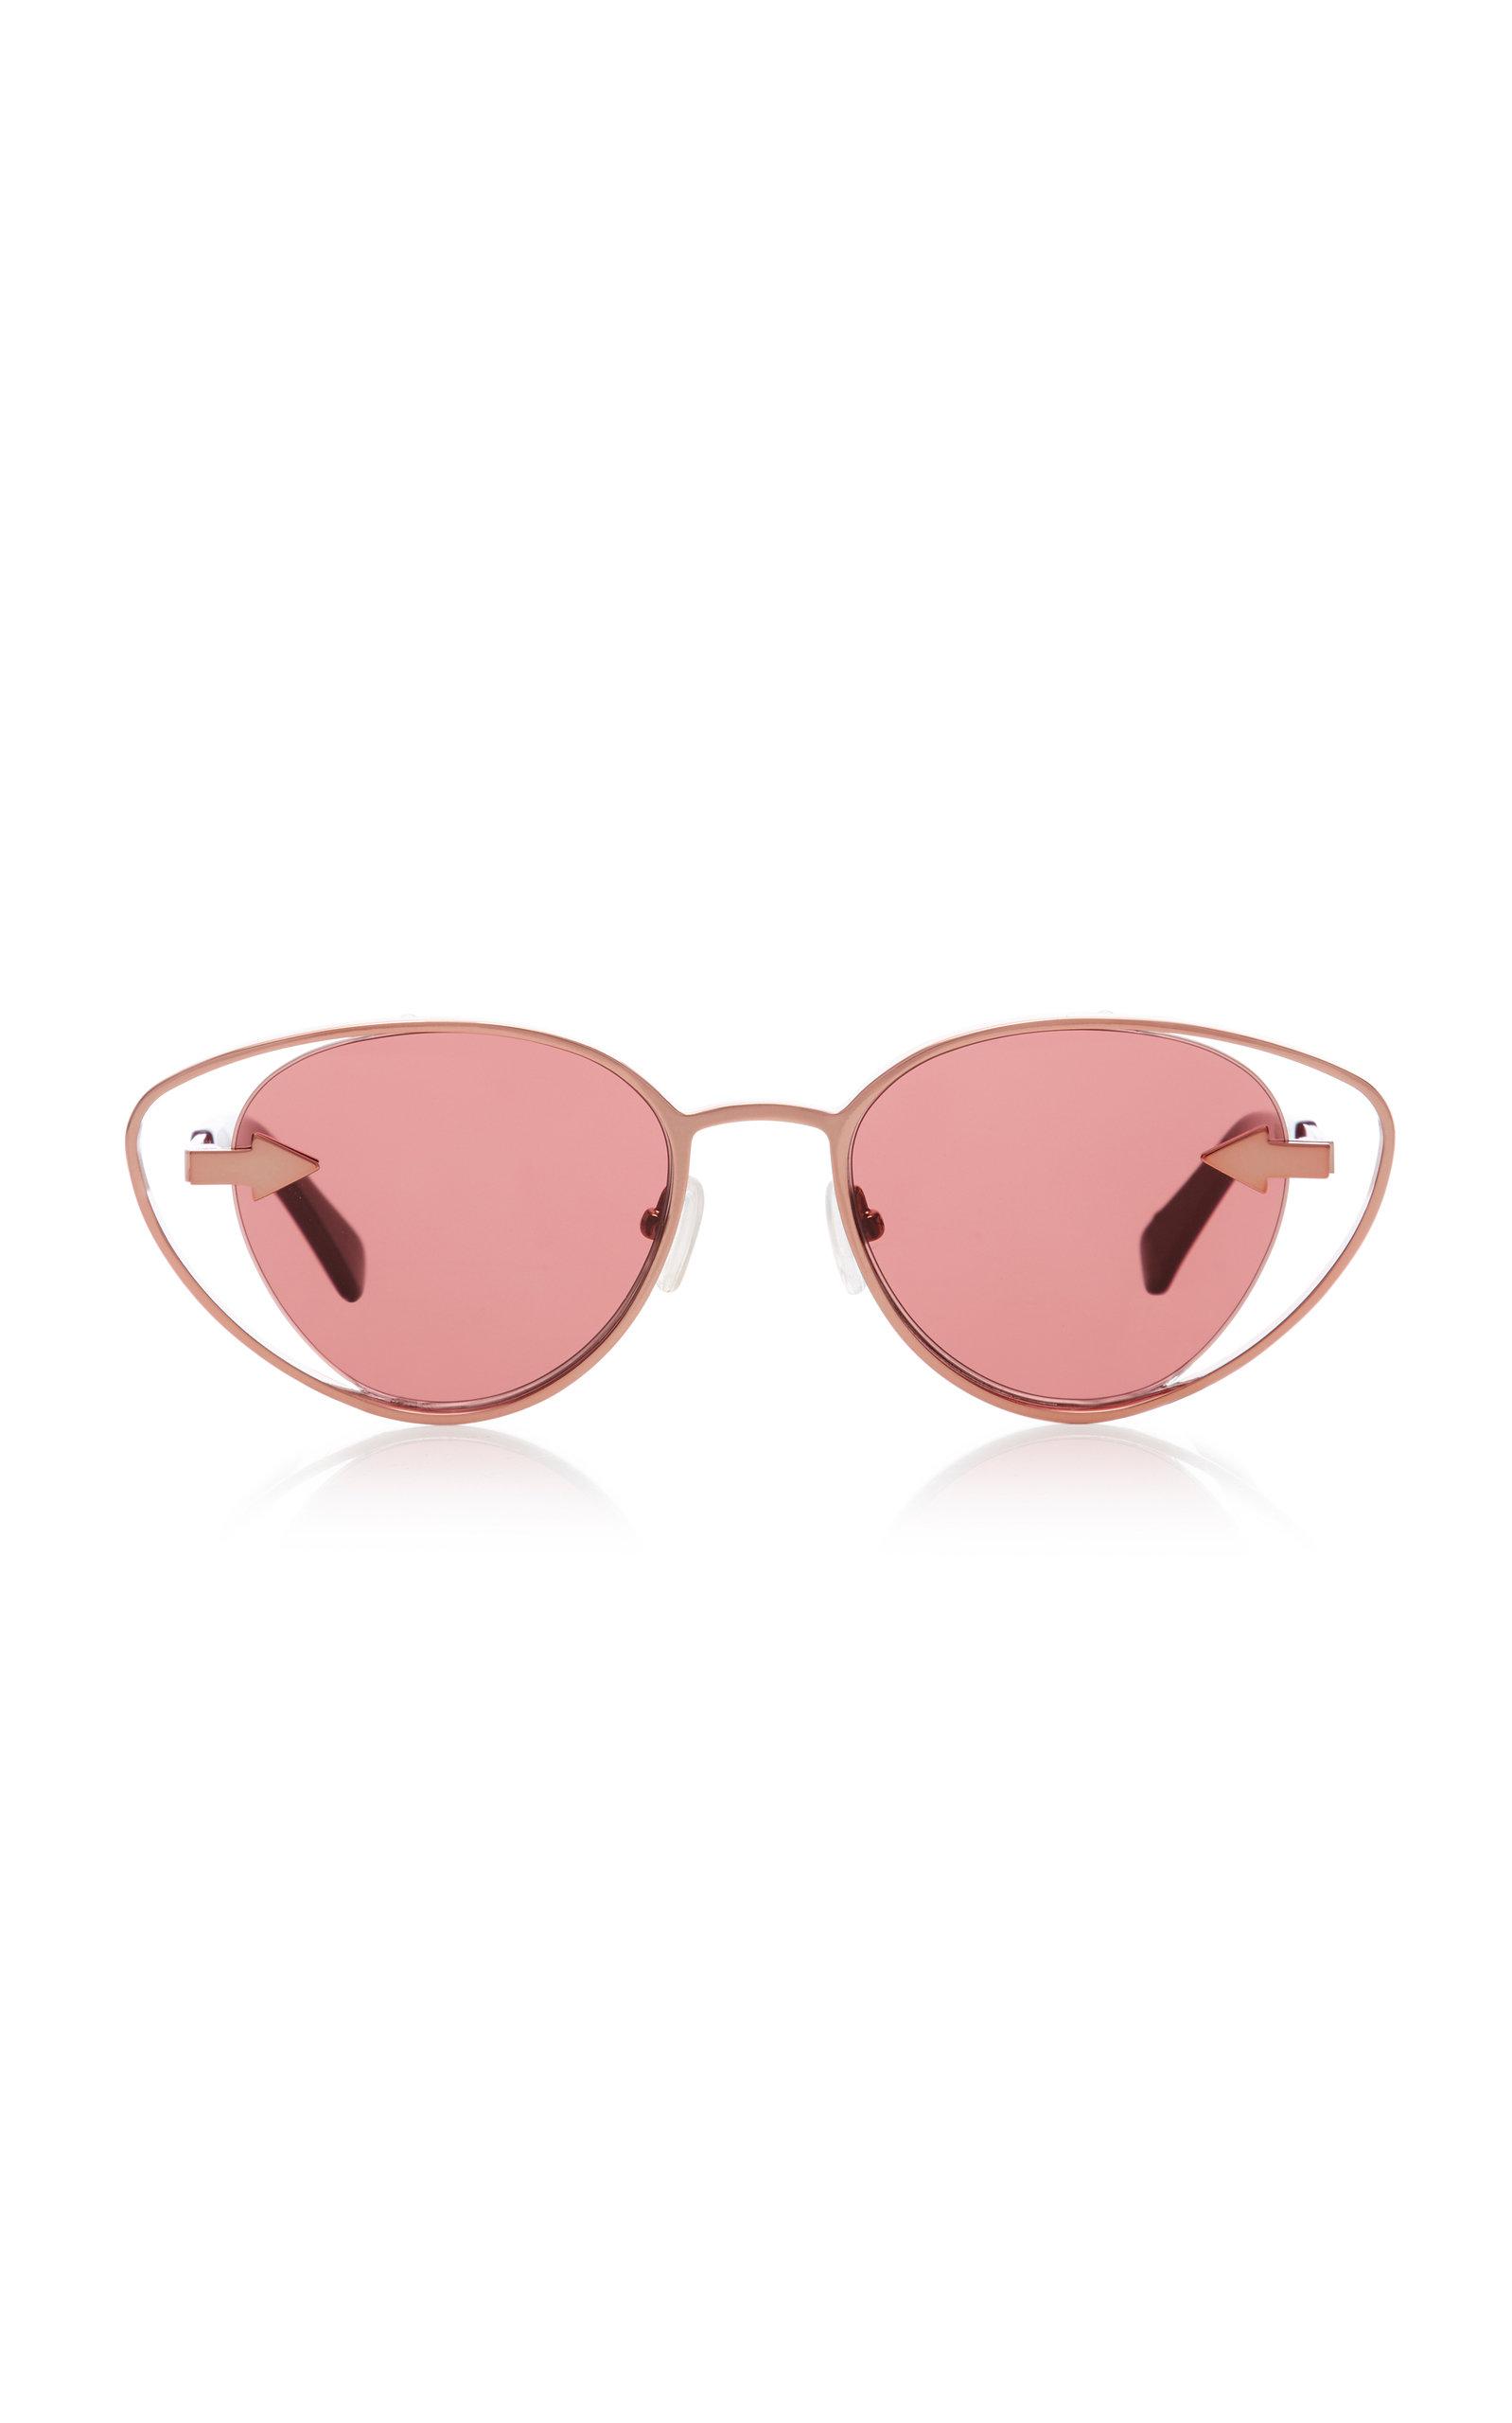 cc5df7a3dcc8 Karen Walker Kissy Kissy Cat-Eye Sunglasses In Pink | ModeSens